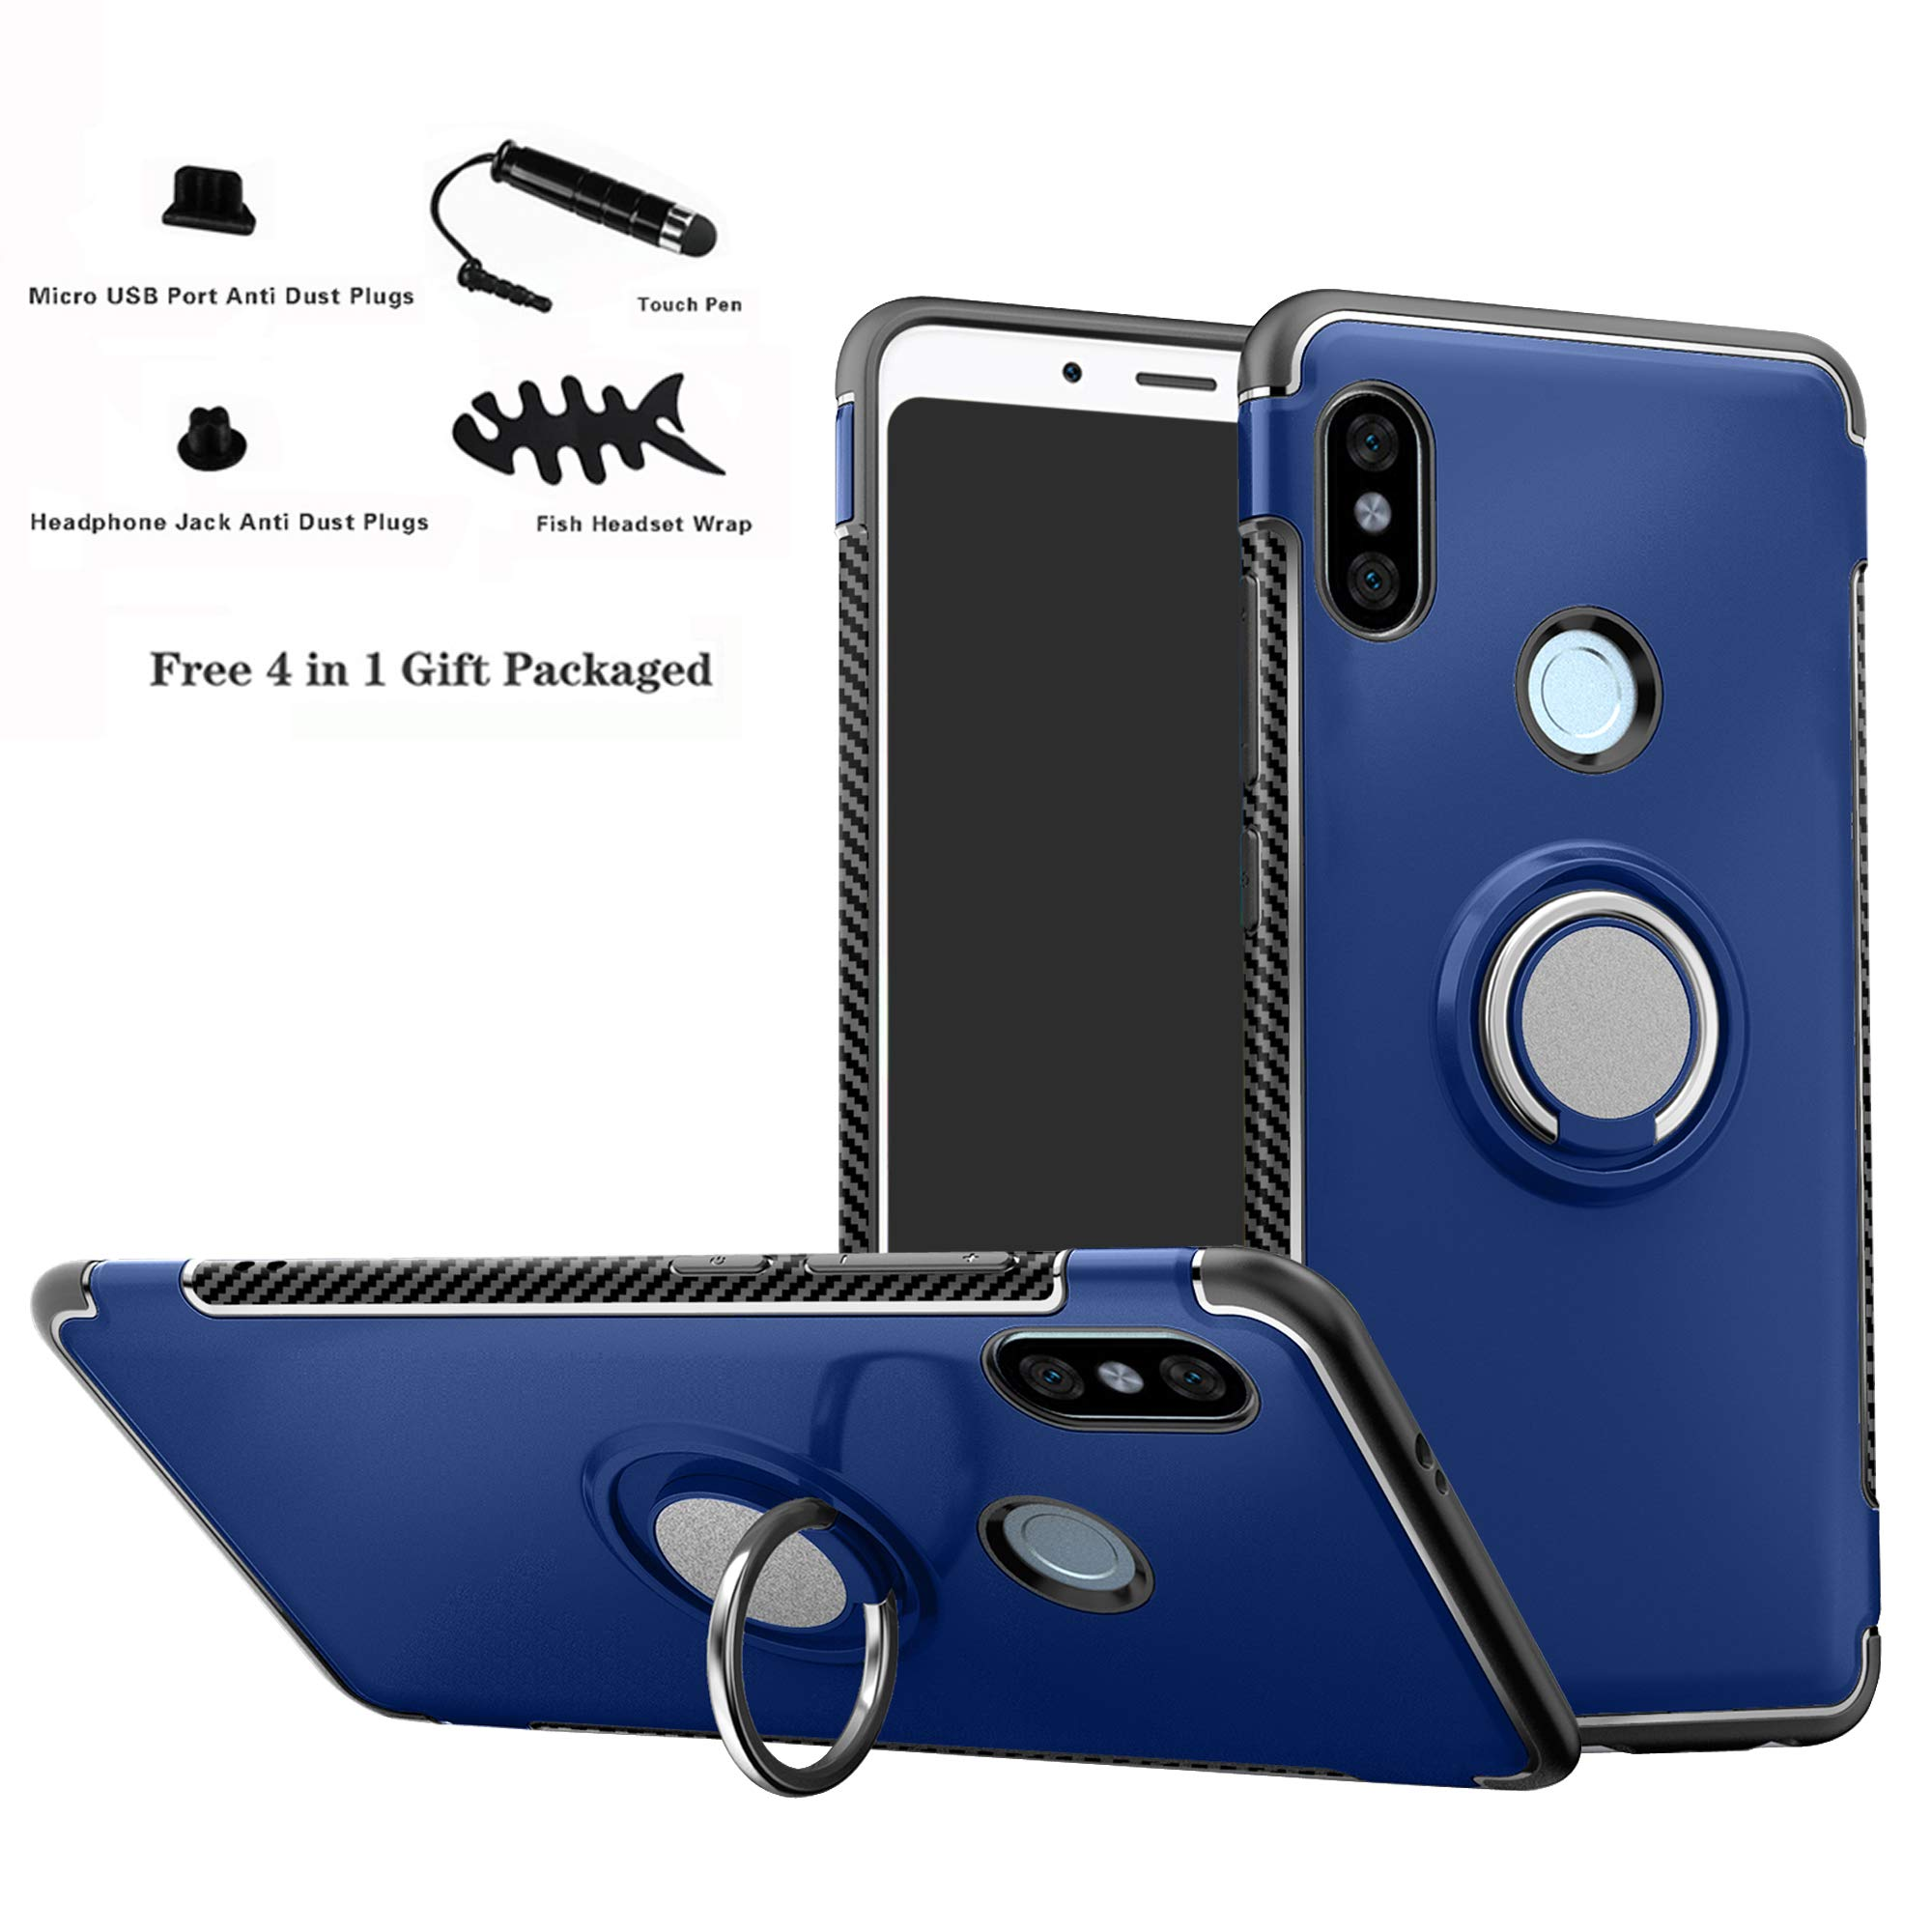 Xiaomi Redmi Note 5 Funda,Labanema 360 Rotating Ring Grip Stand Holder Capa TPU + PC Shockproof Anti-rasguños teléfono caso protección Cáscara Cover para Xiaomi Redmi Note 5 / Redmi Note 5 Pro: Amazon.es: Electrónica